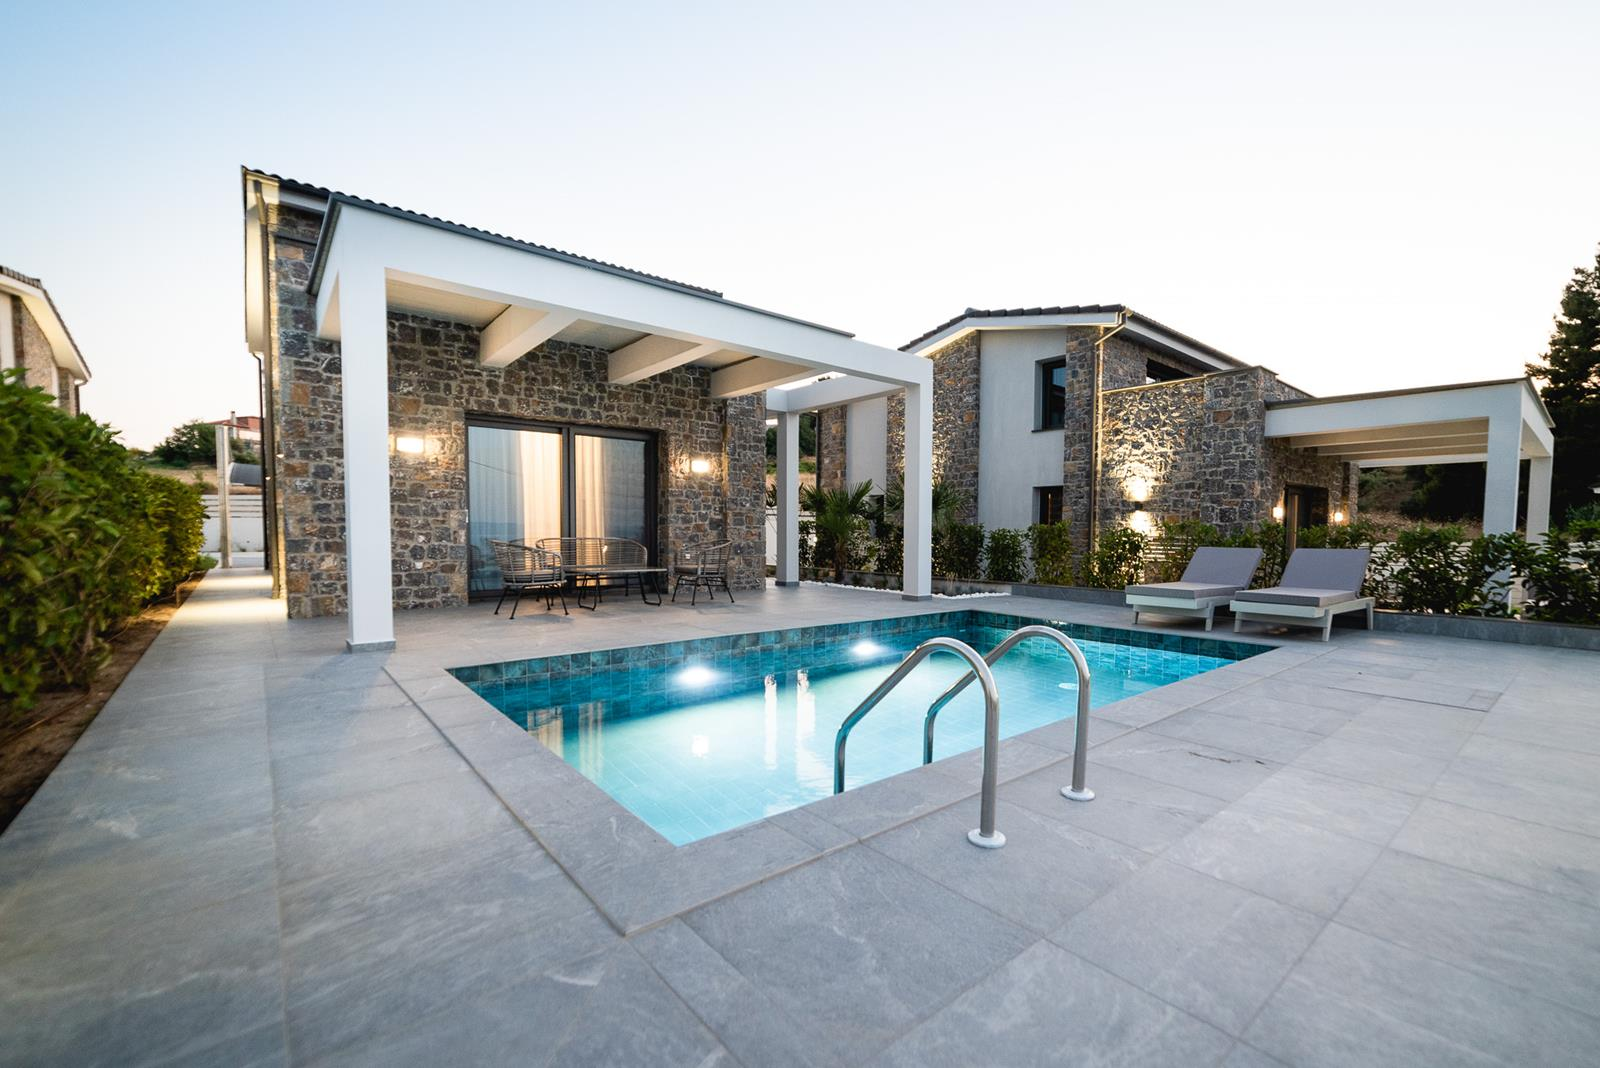 luxury-villas-and-suites-terra-olivia-paliouri-chalkidiki-greece-hotel-185-Copy.jpg